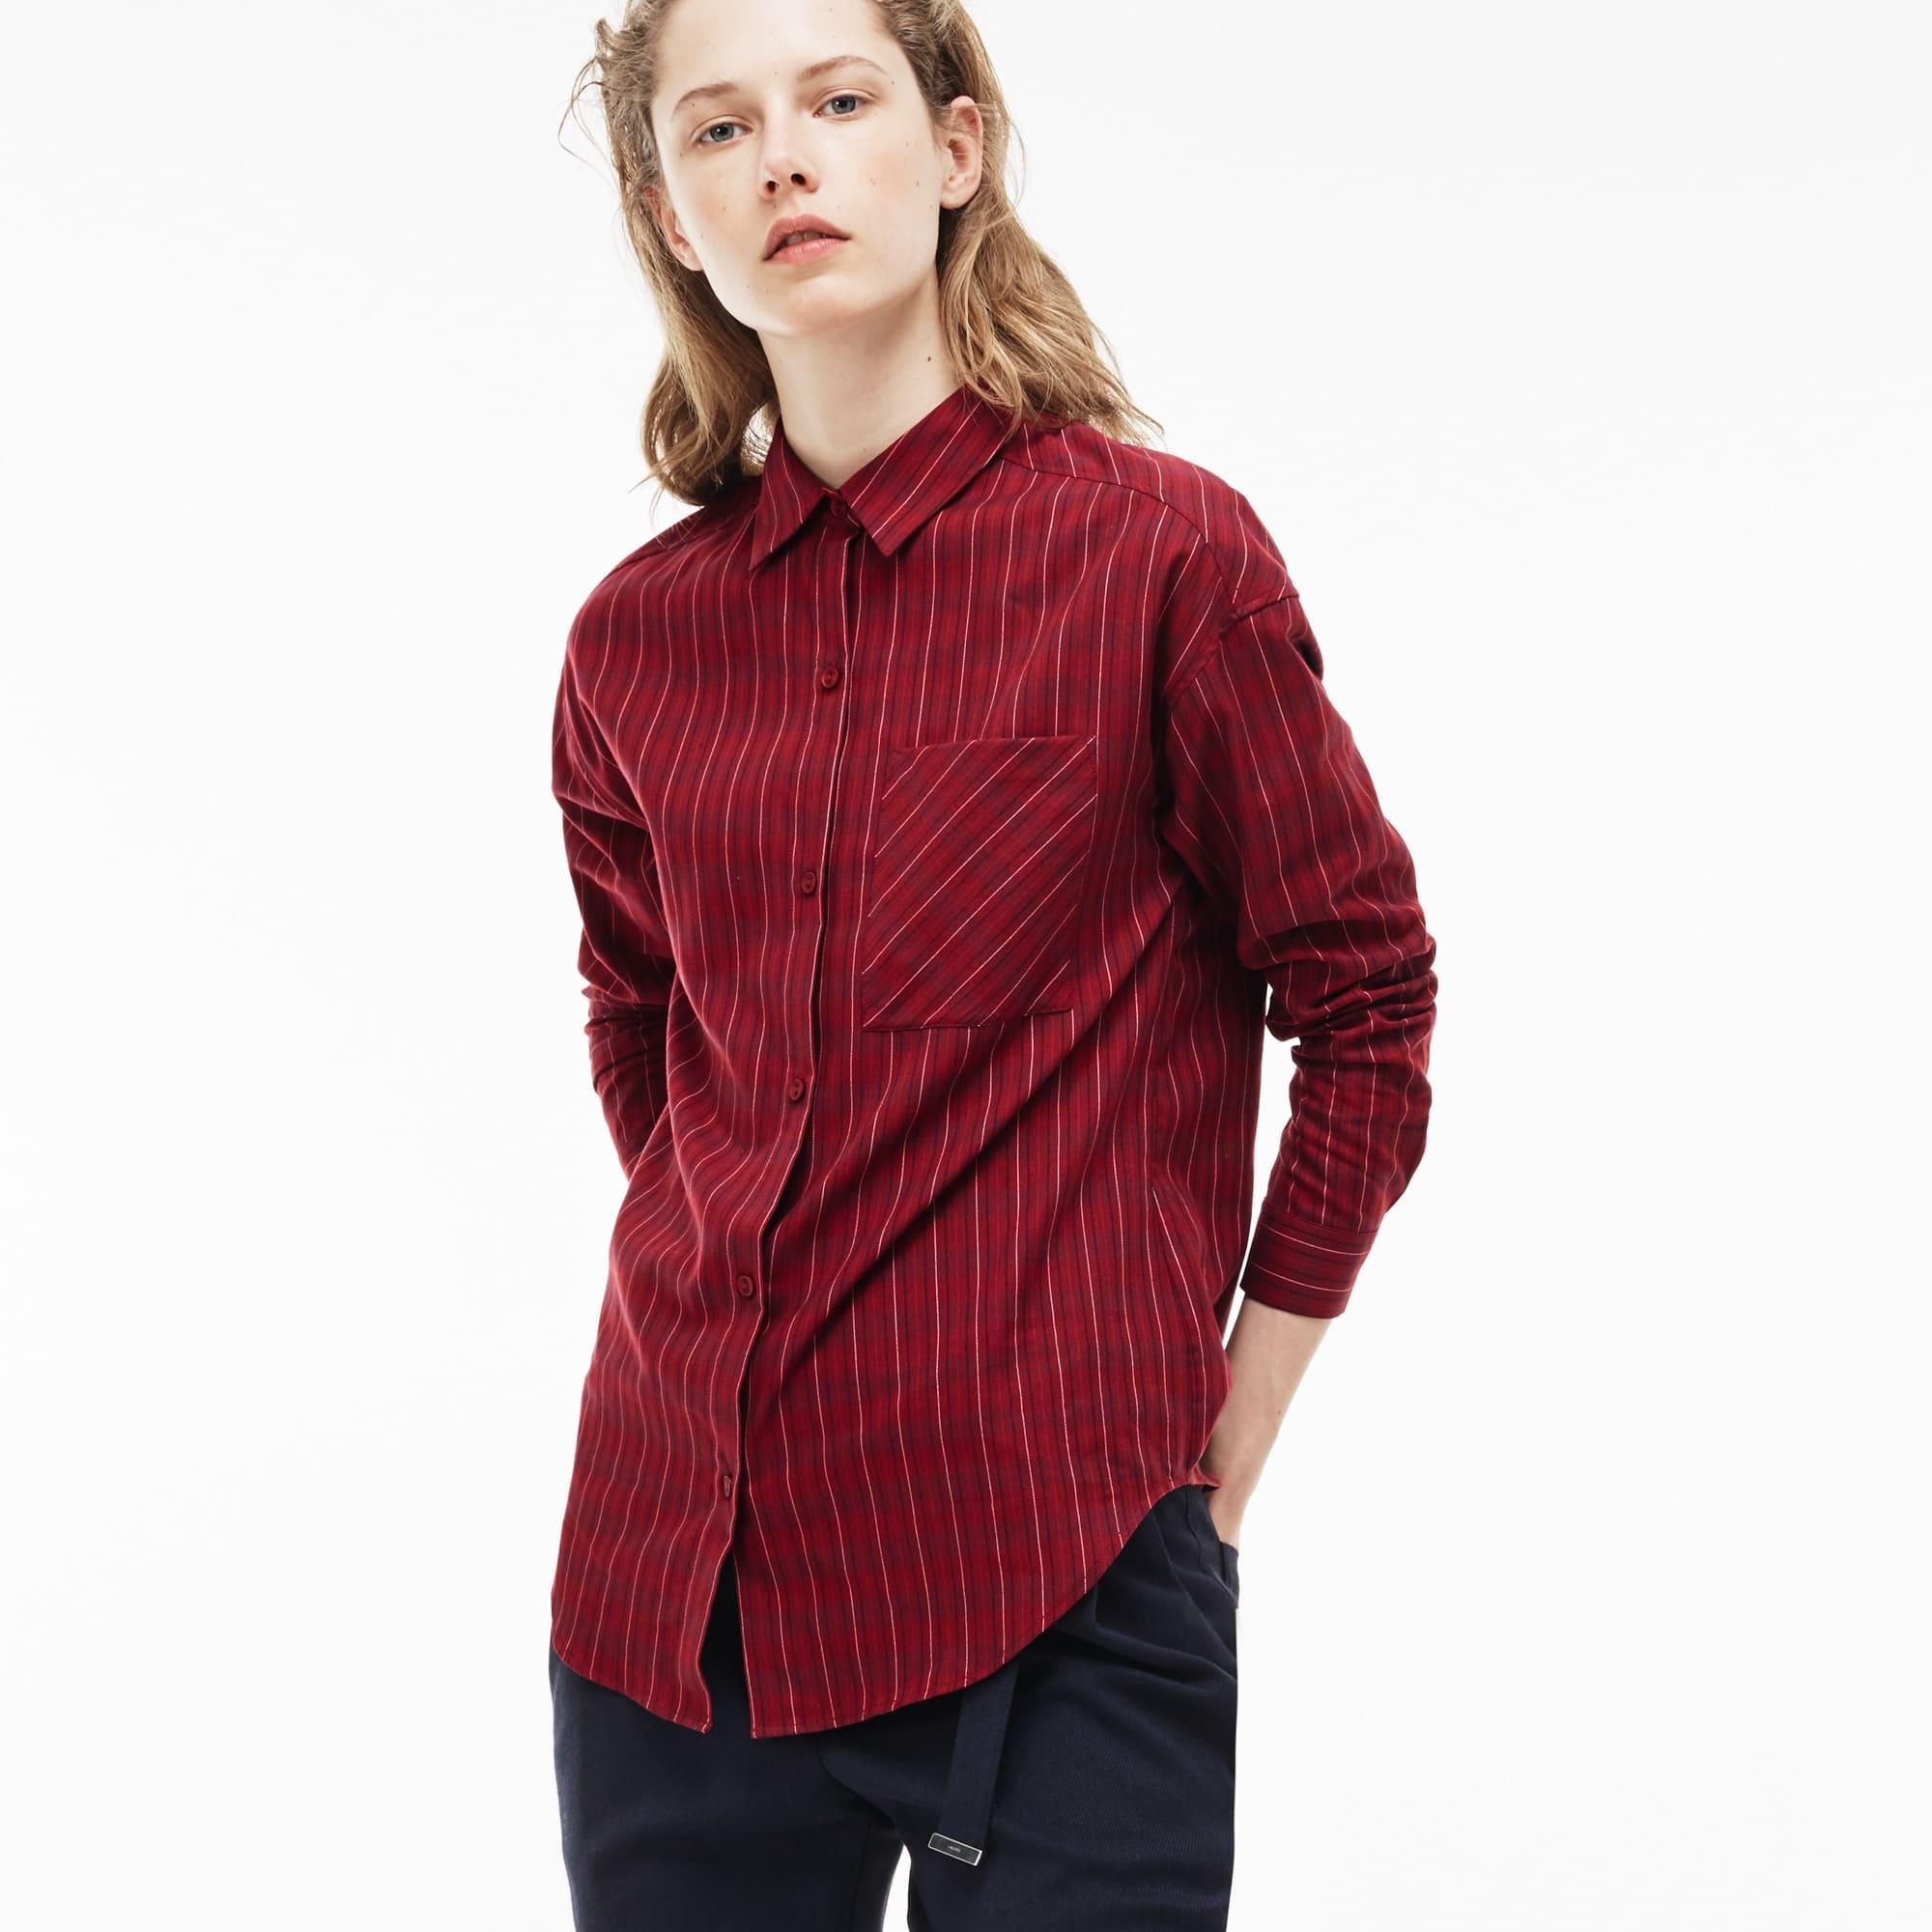 01703bb3d83f9 Women s Check Cotton Poplin Shirt